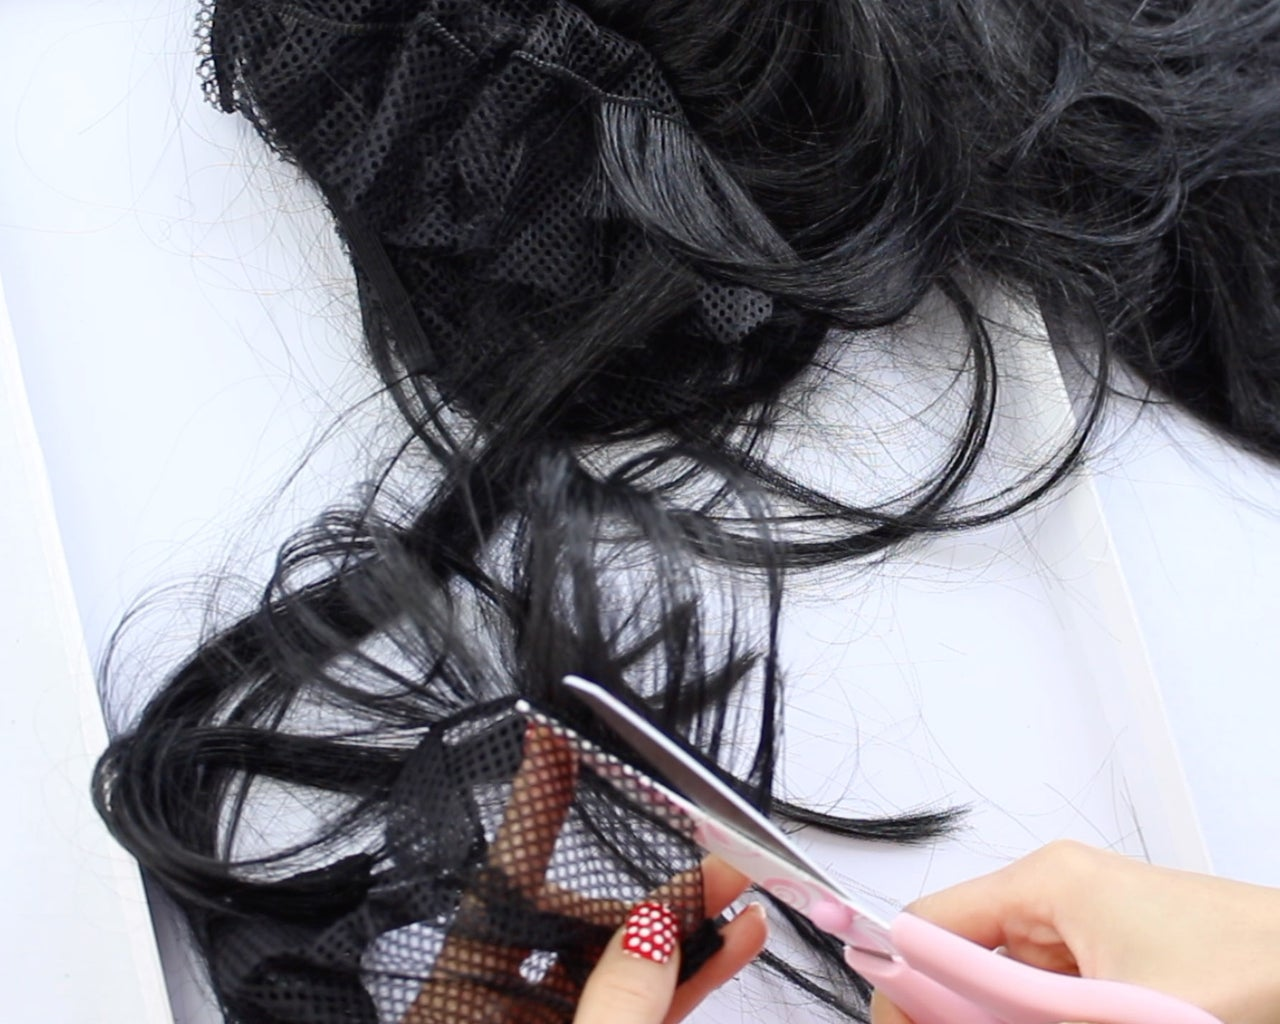 Cutting the Wig